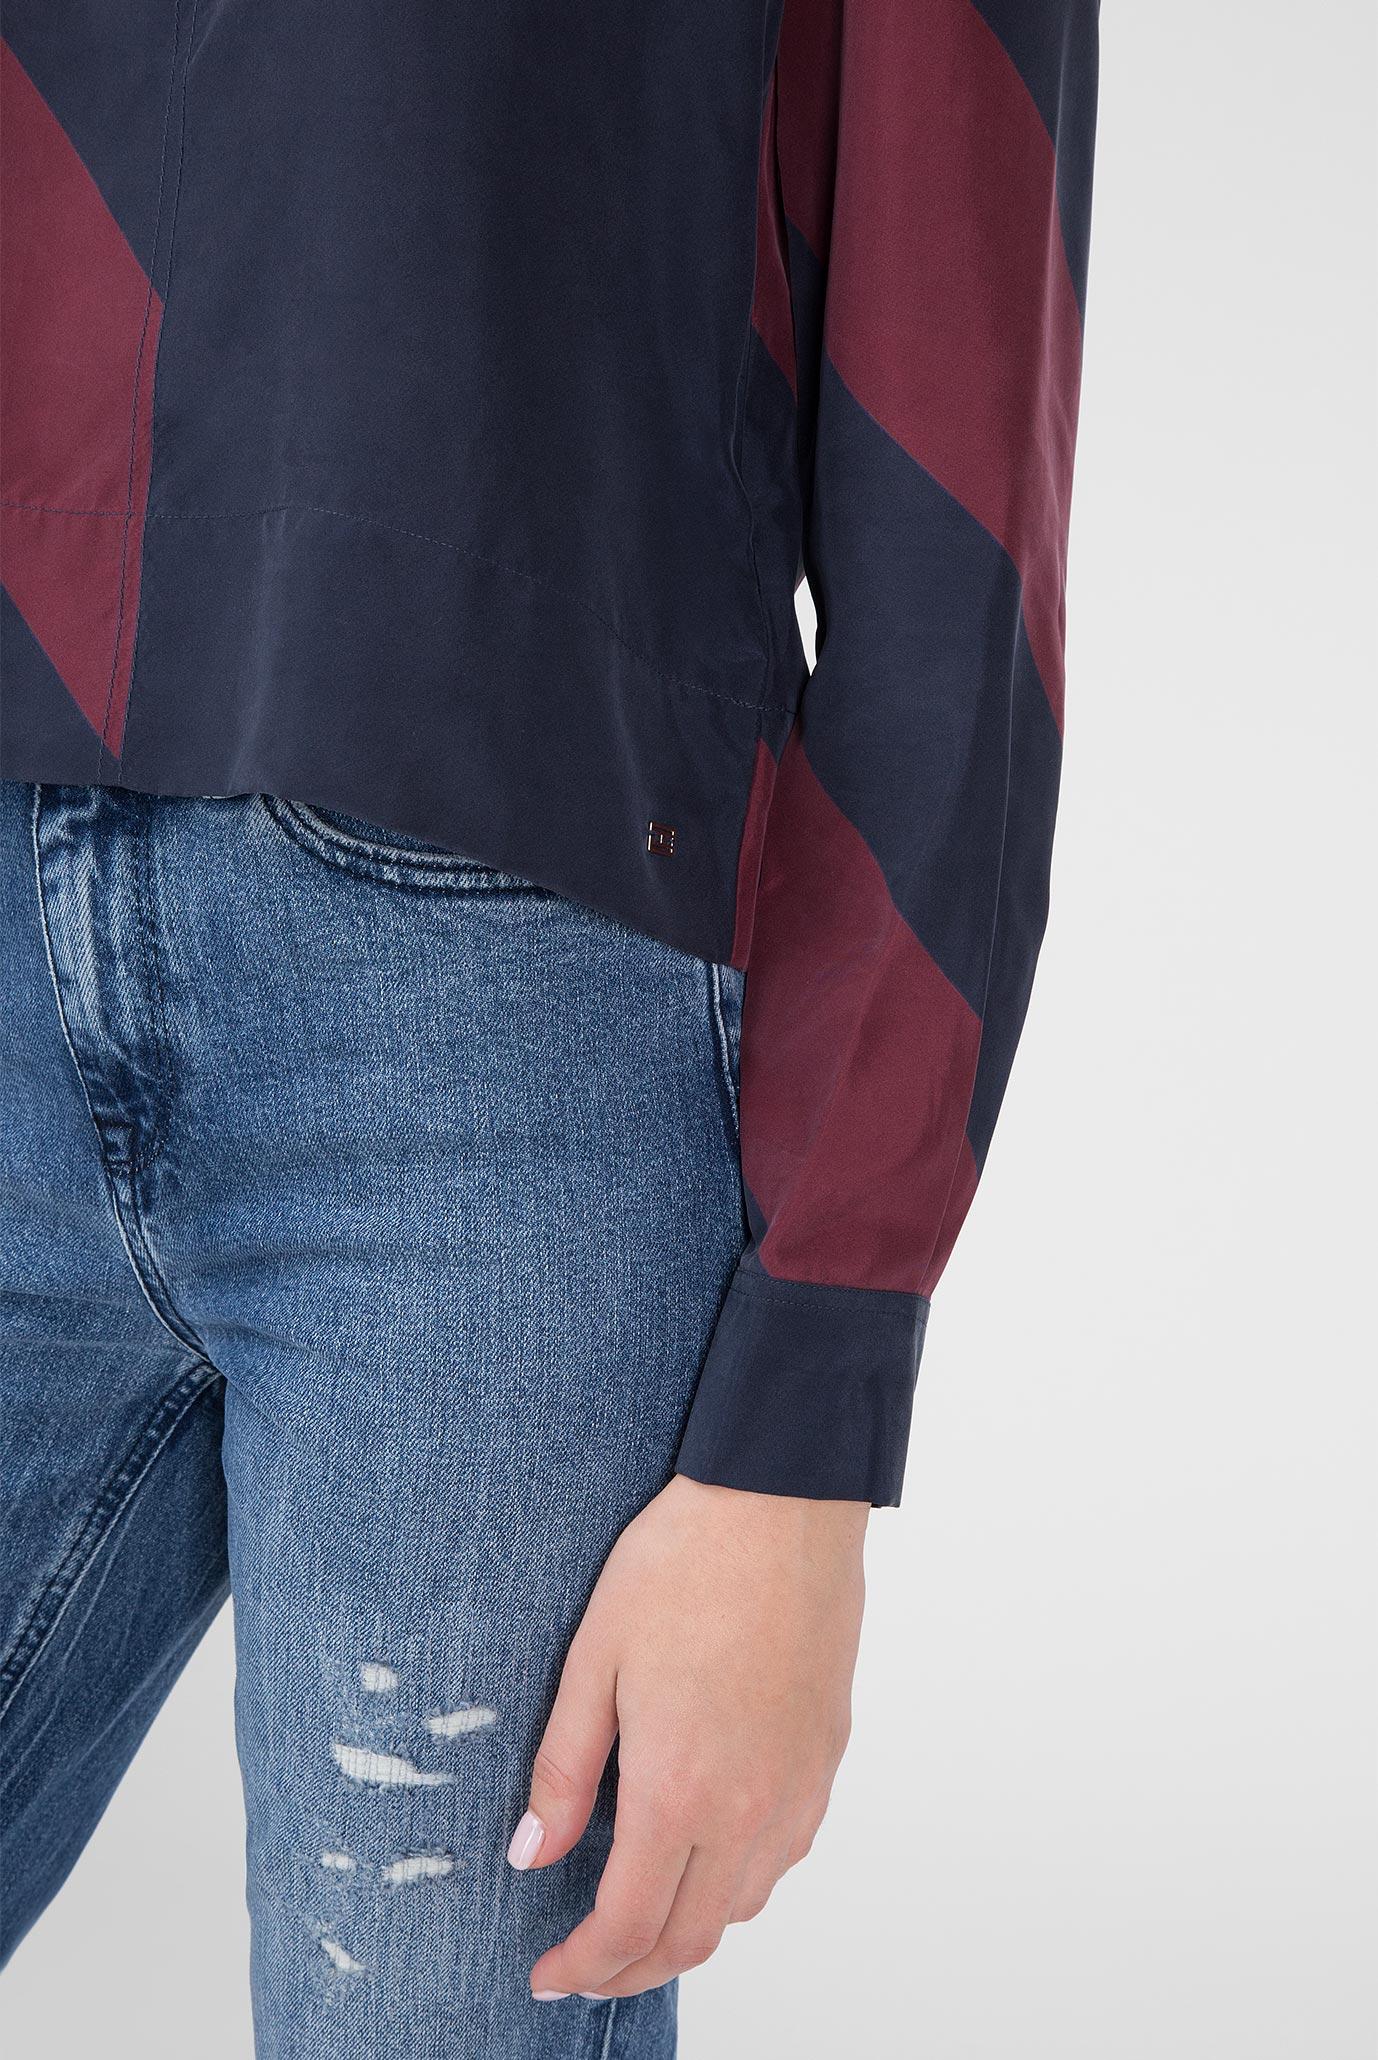 Купить Женская темно-синяя блуза ICON CROPPED SILK BLOUSE Tommy Hilfiger Tommy Hilfiger WW0WW23730 – Киев, Украина. Цены в интернет магазине MD Fashion